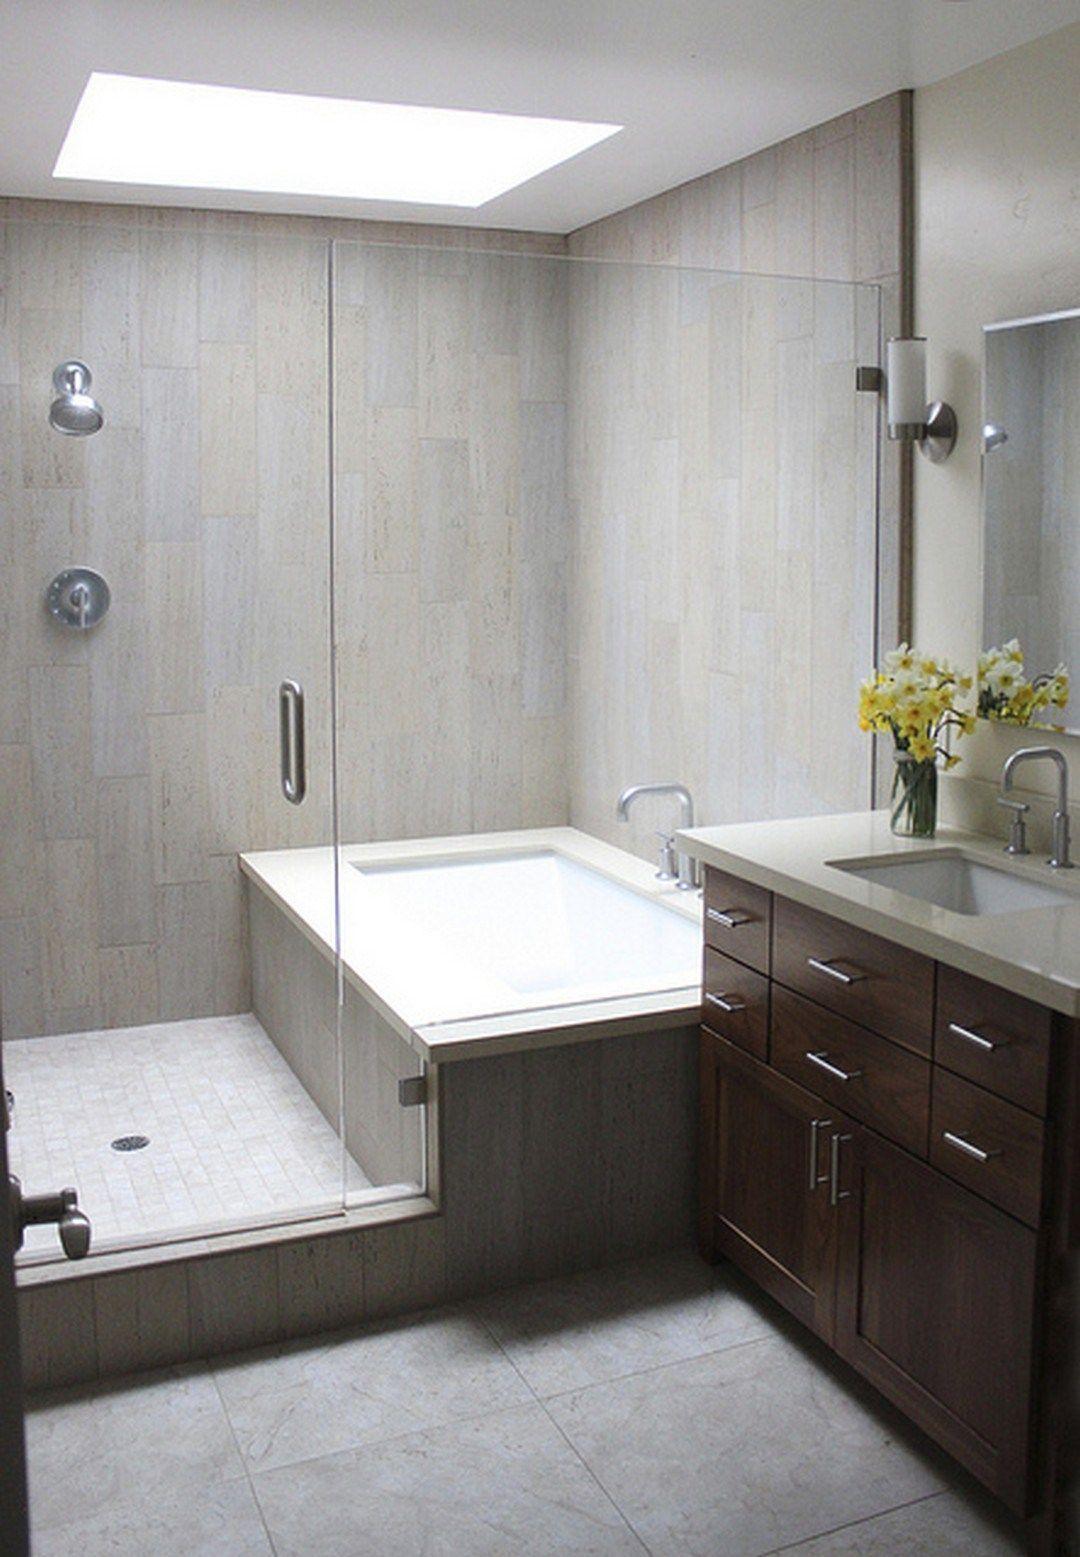 99 Small Master Bathroom Makeover Ideas On A Budget 65  Home Stunning Small Bathroom Makeover Ideas Inspiration Design